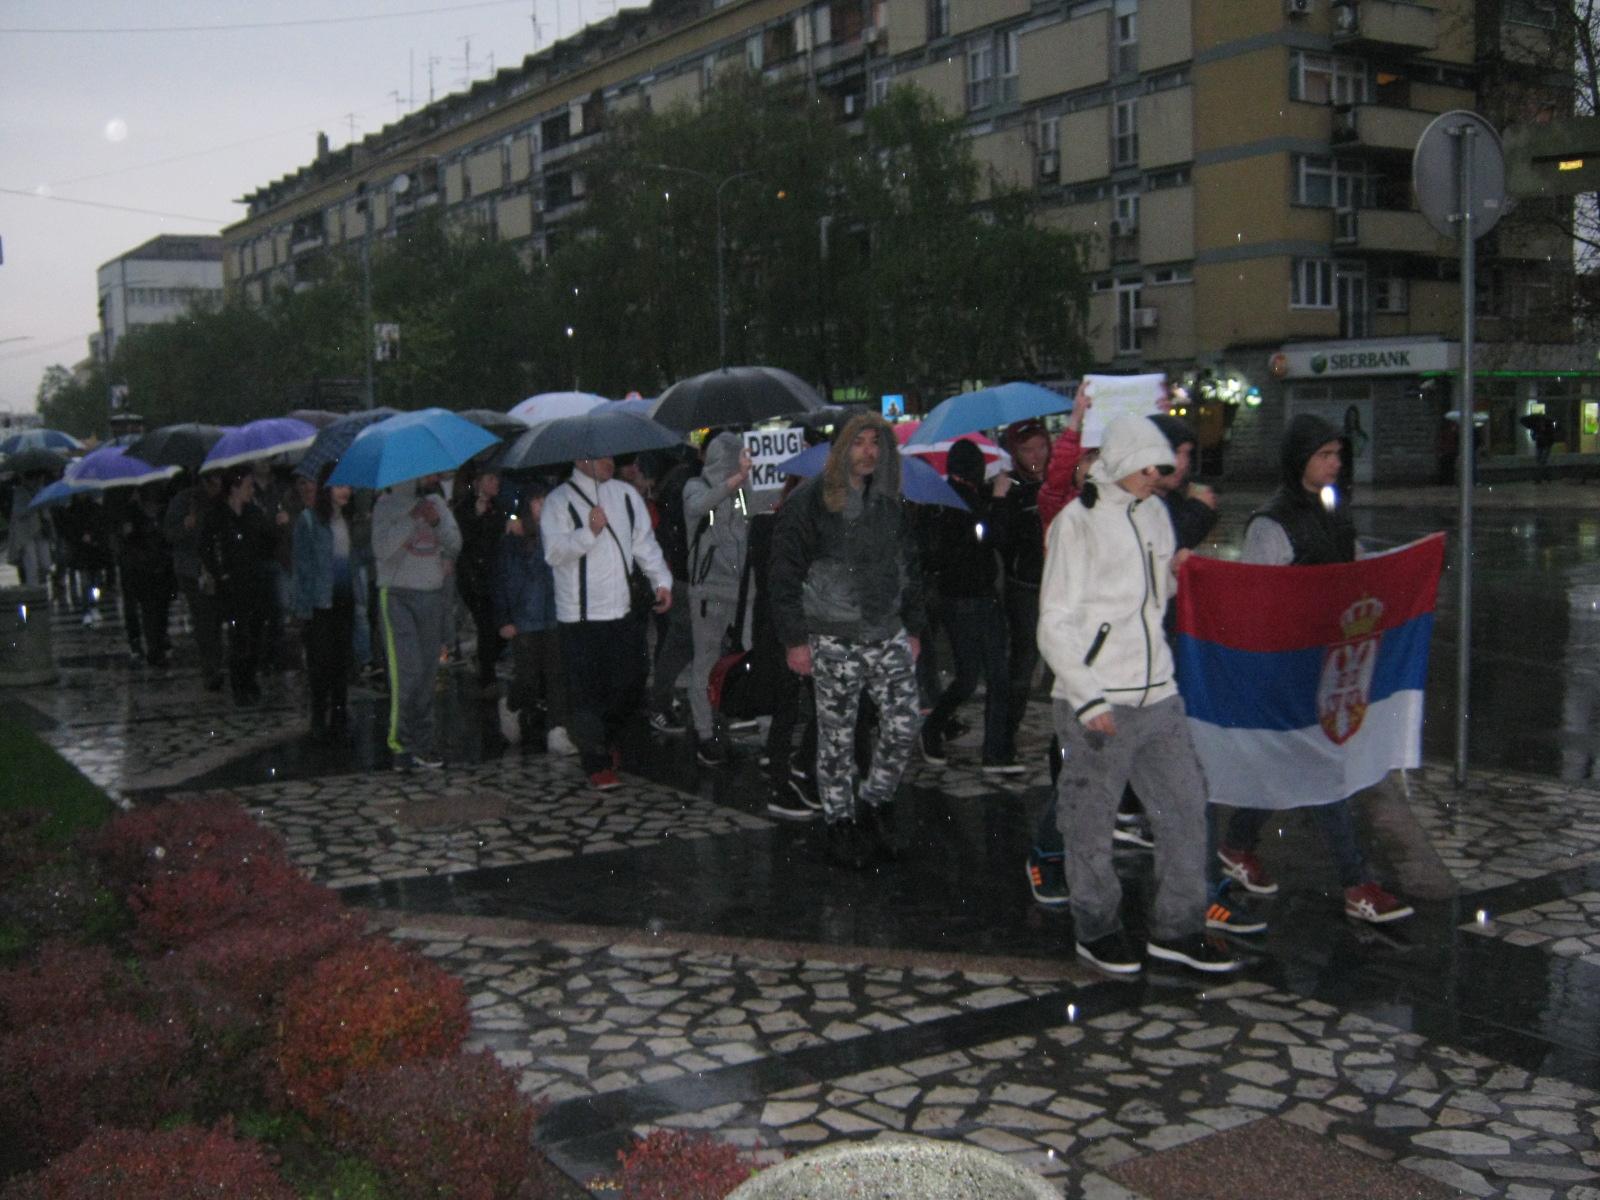 protesti u krusevcu foto s.milenkovic